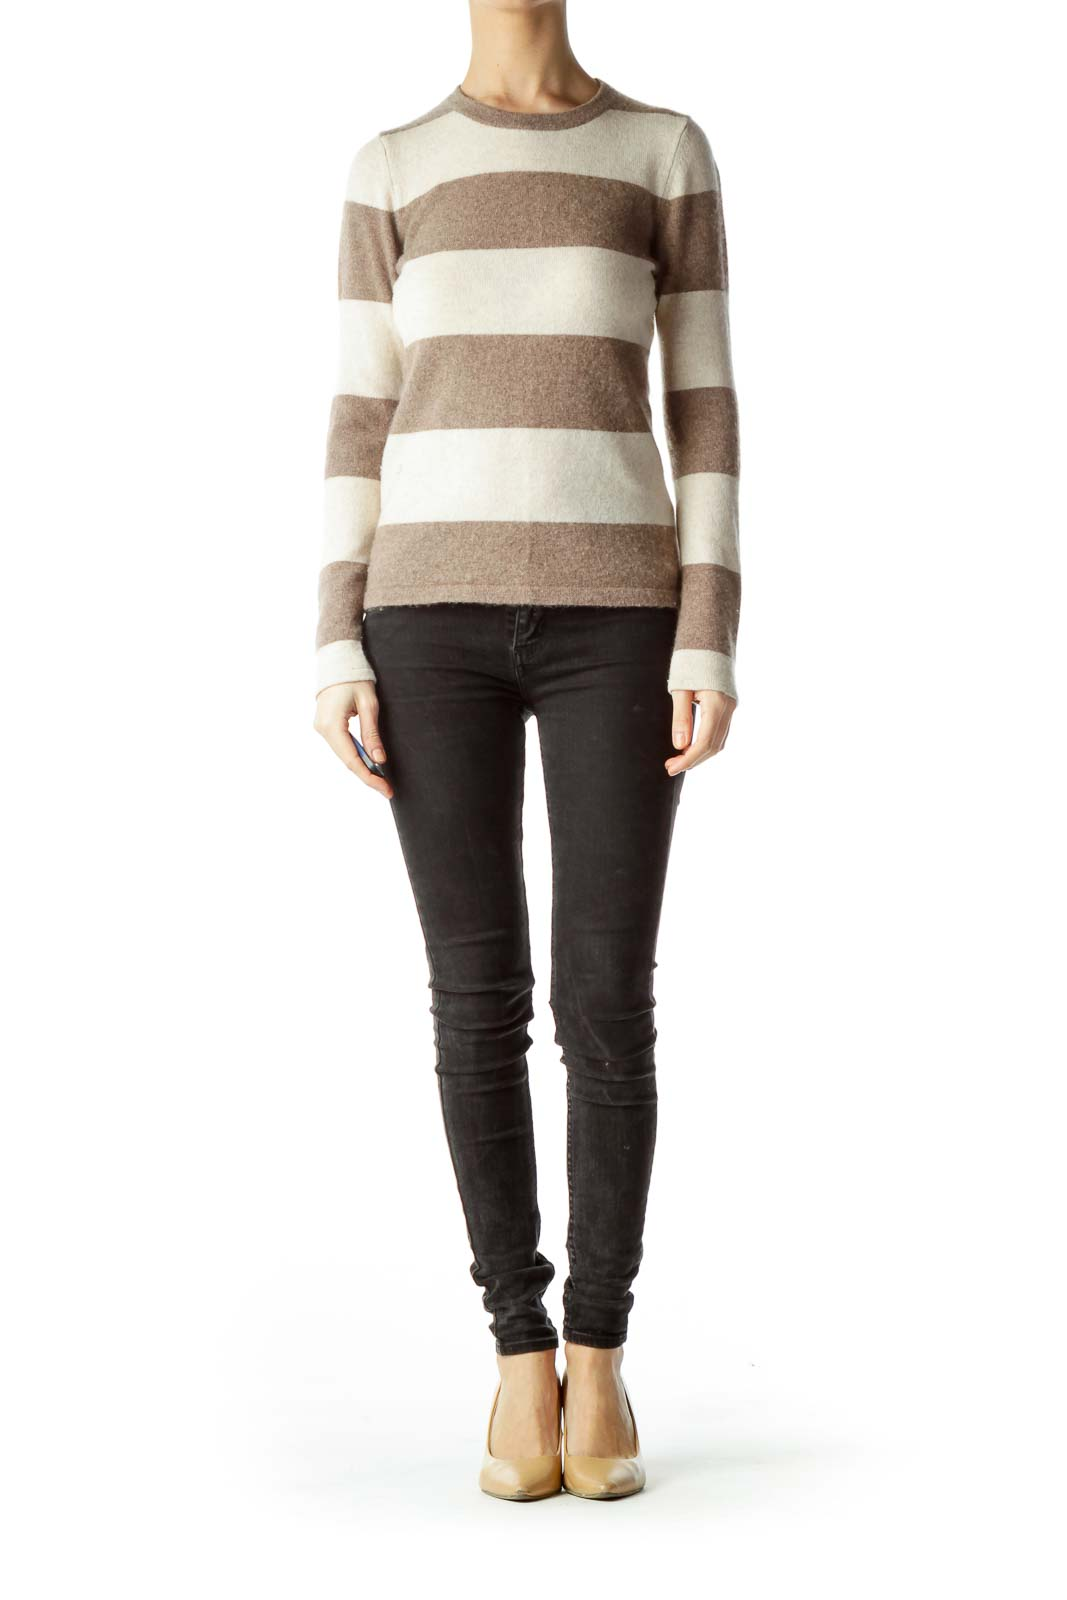 Brown Beige Striped 100% Cashmere Sweater